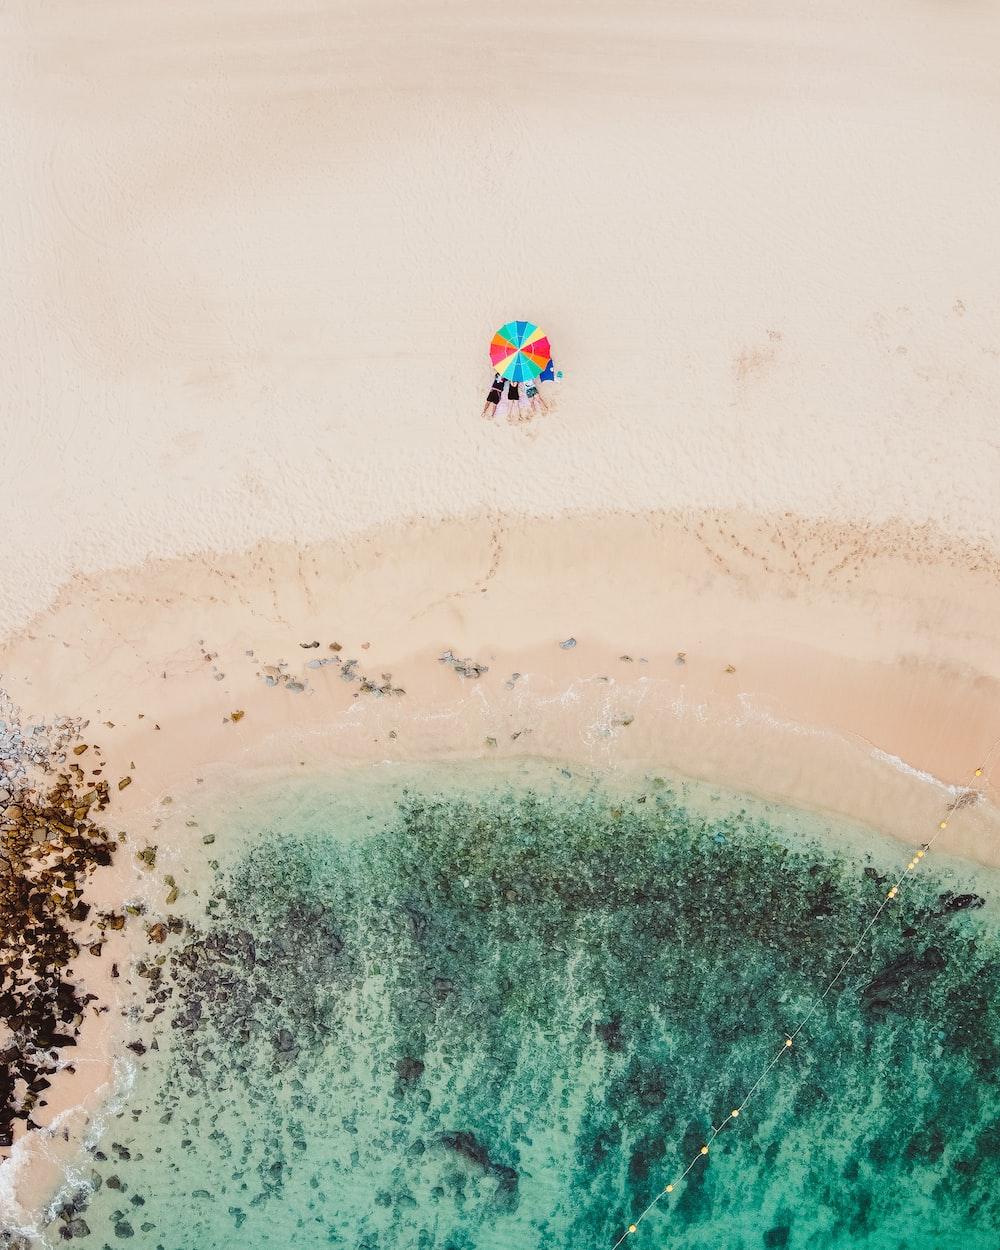 people riding ski lift on beach during daytime